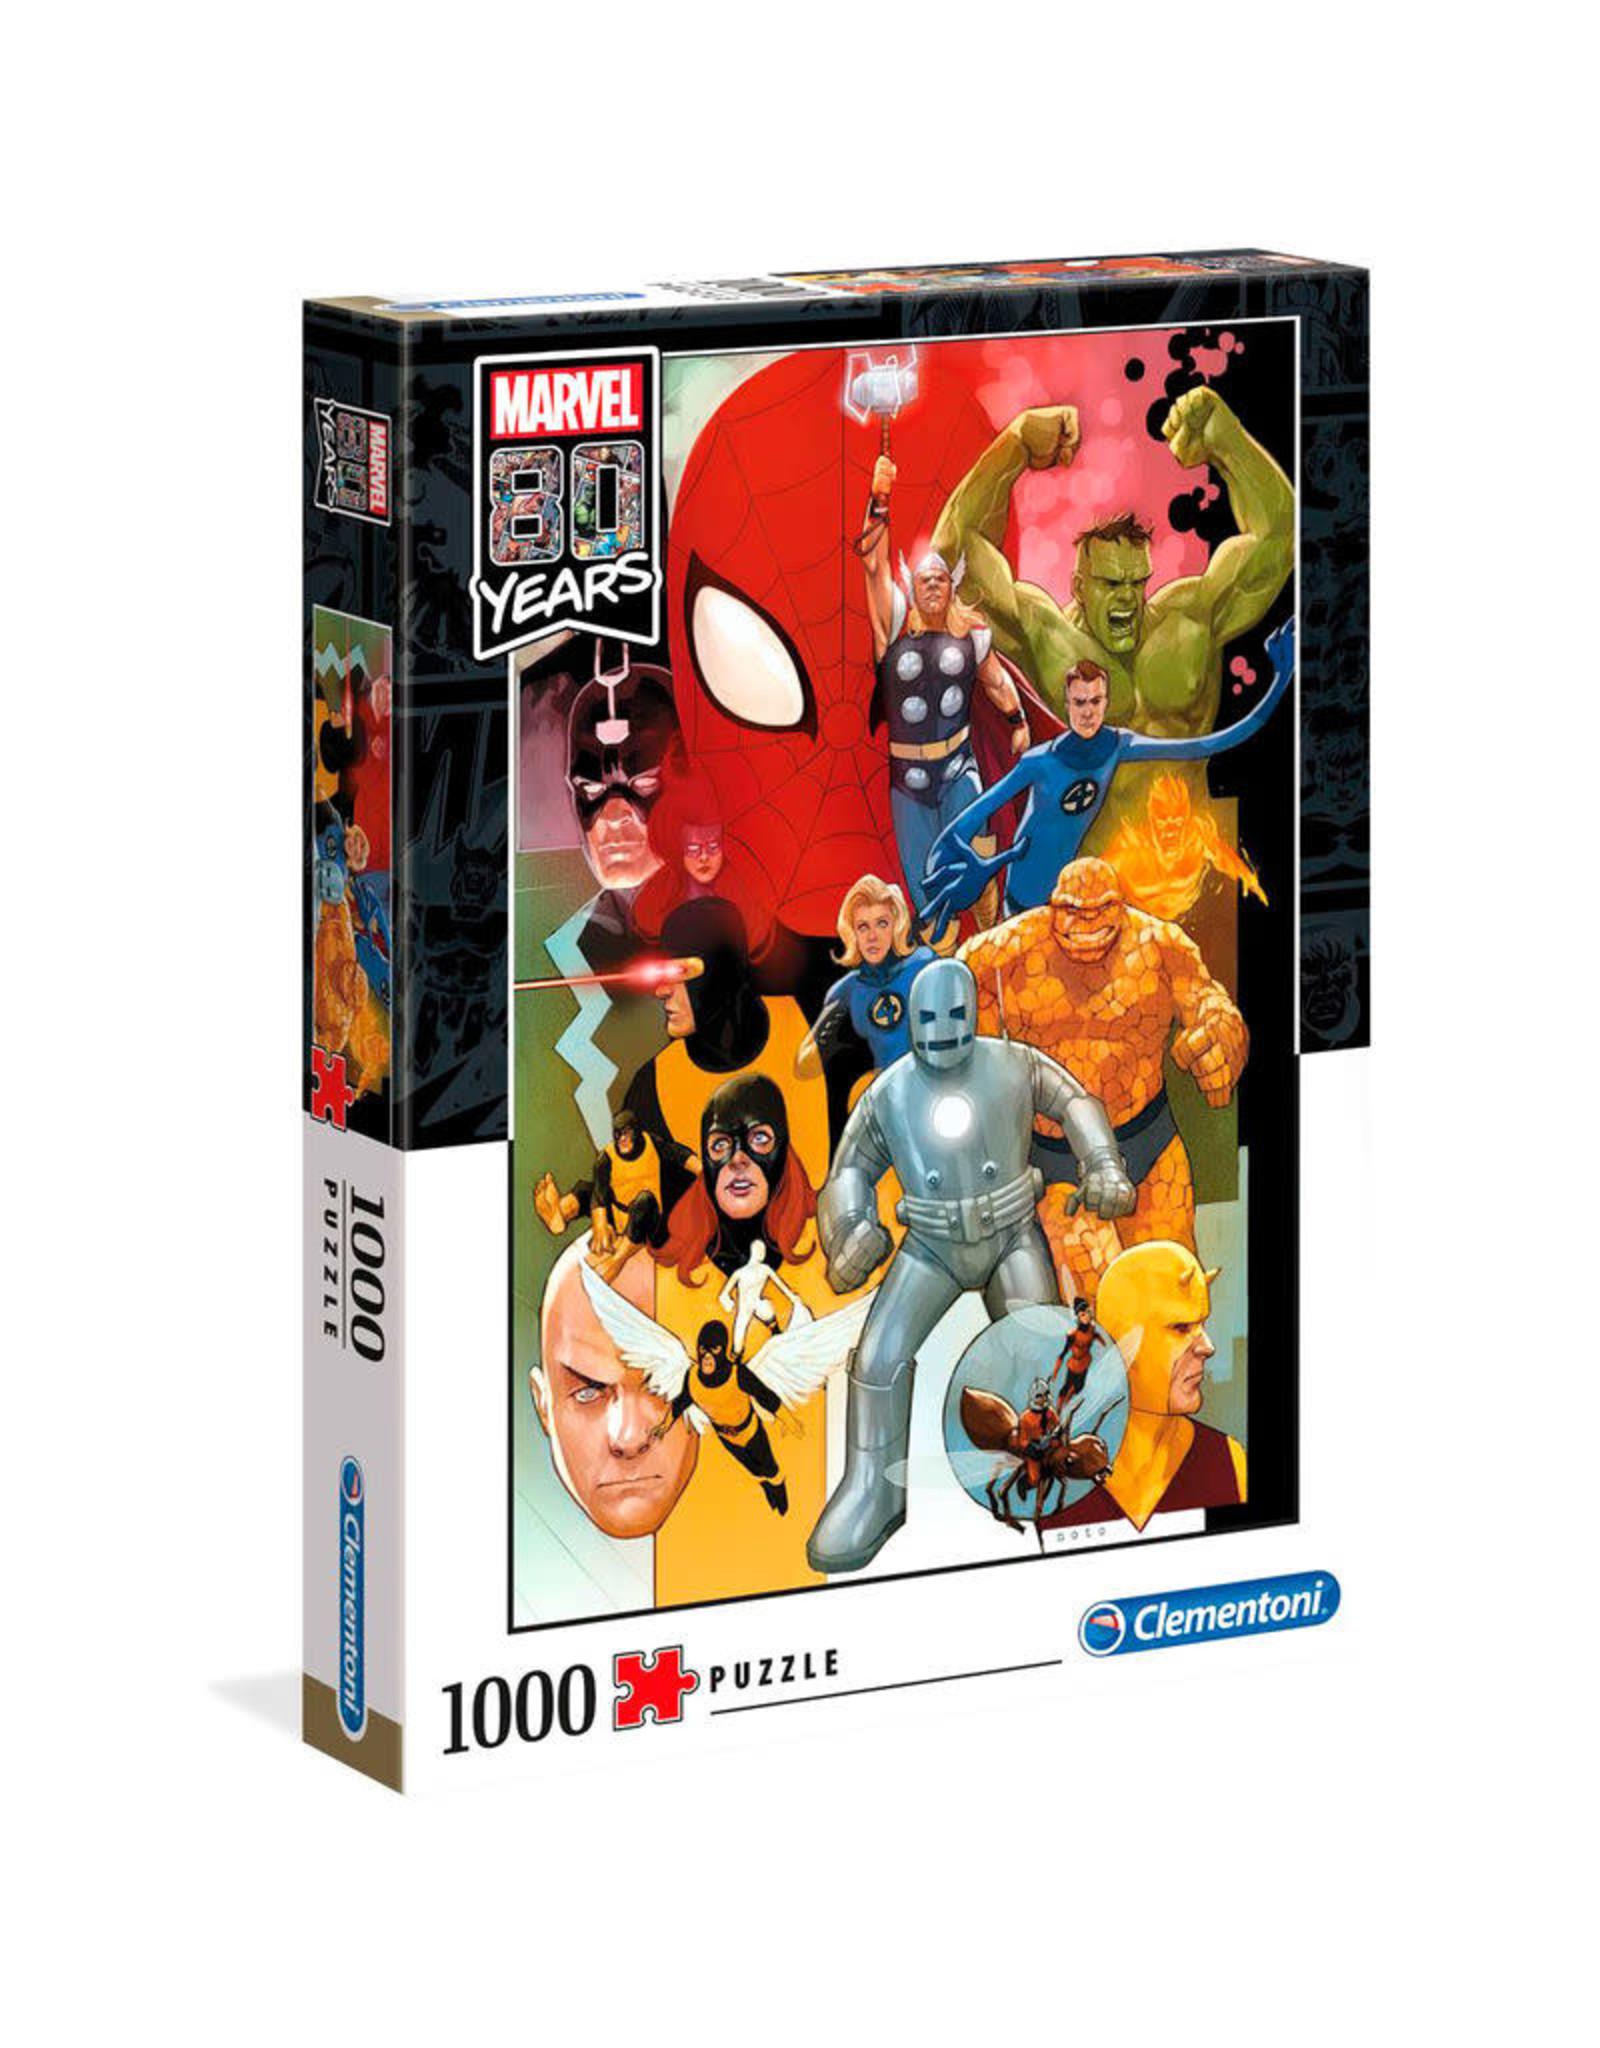 Clementoni MARVEL Puzzle 1000P -  Characters